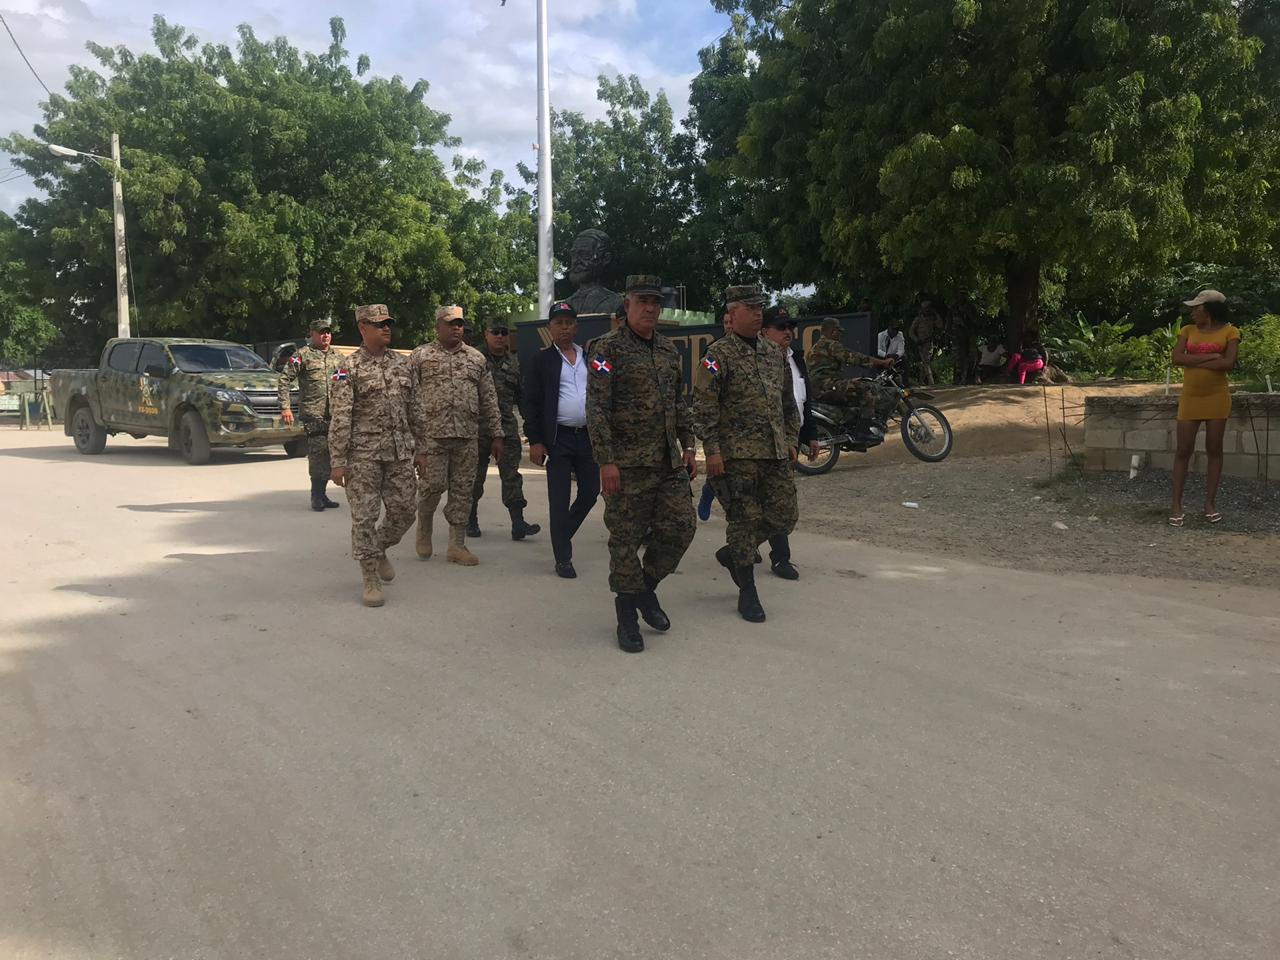 Comandante del Ejército viaja a la frontera a supervisar seguridad